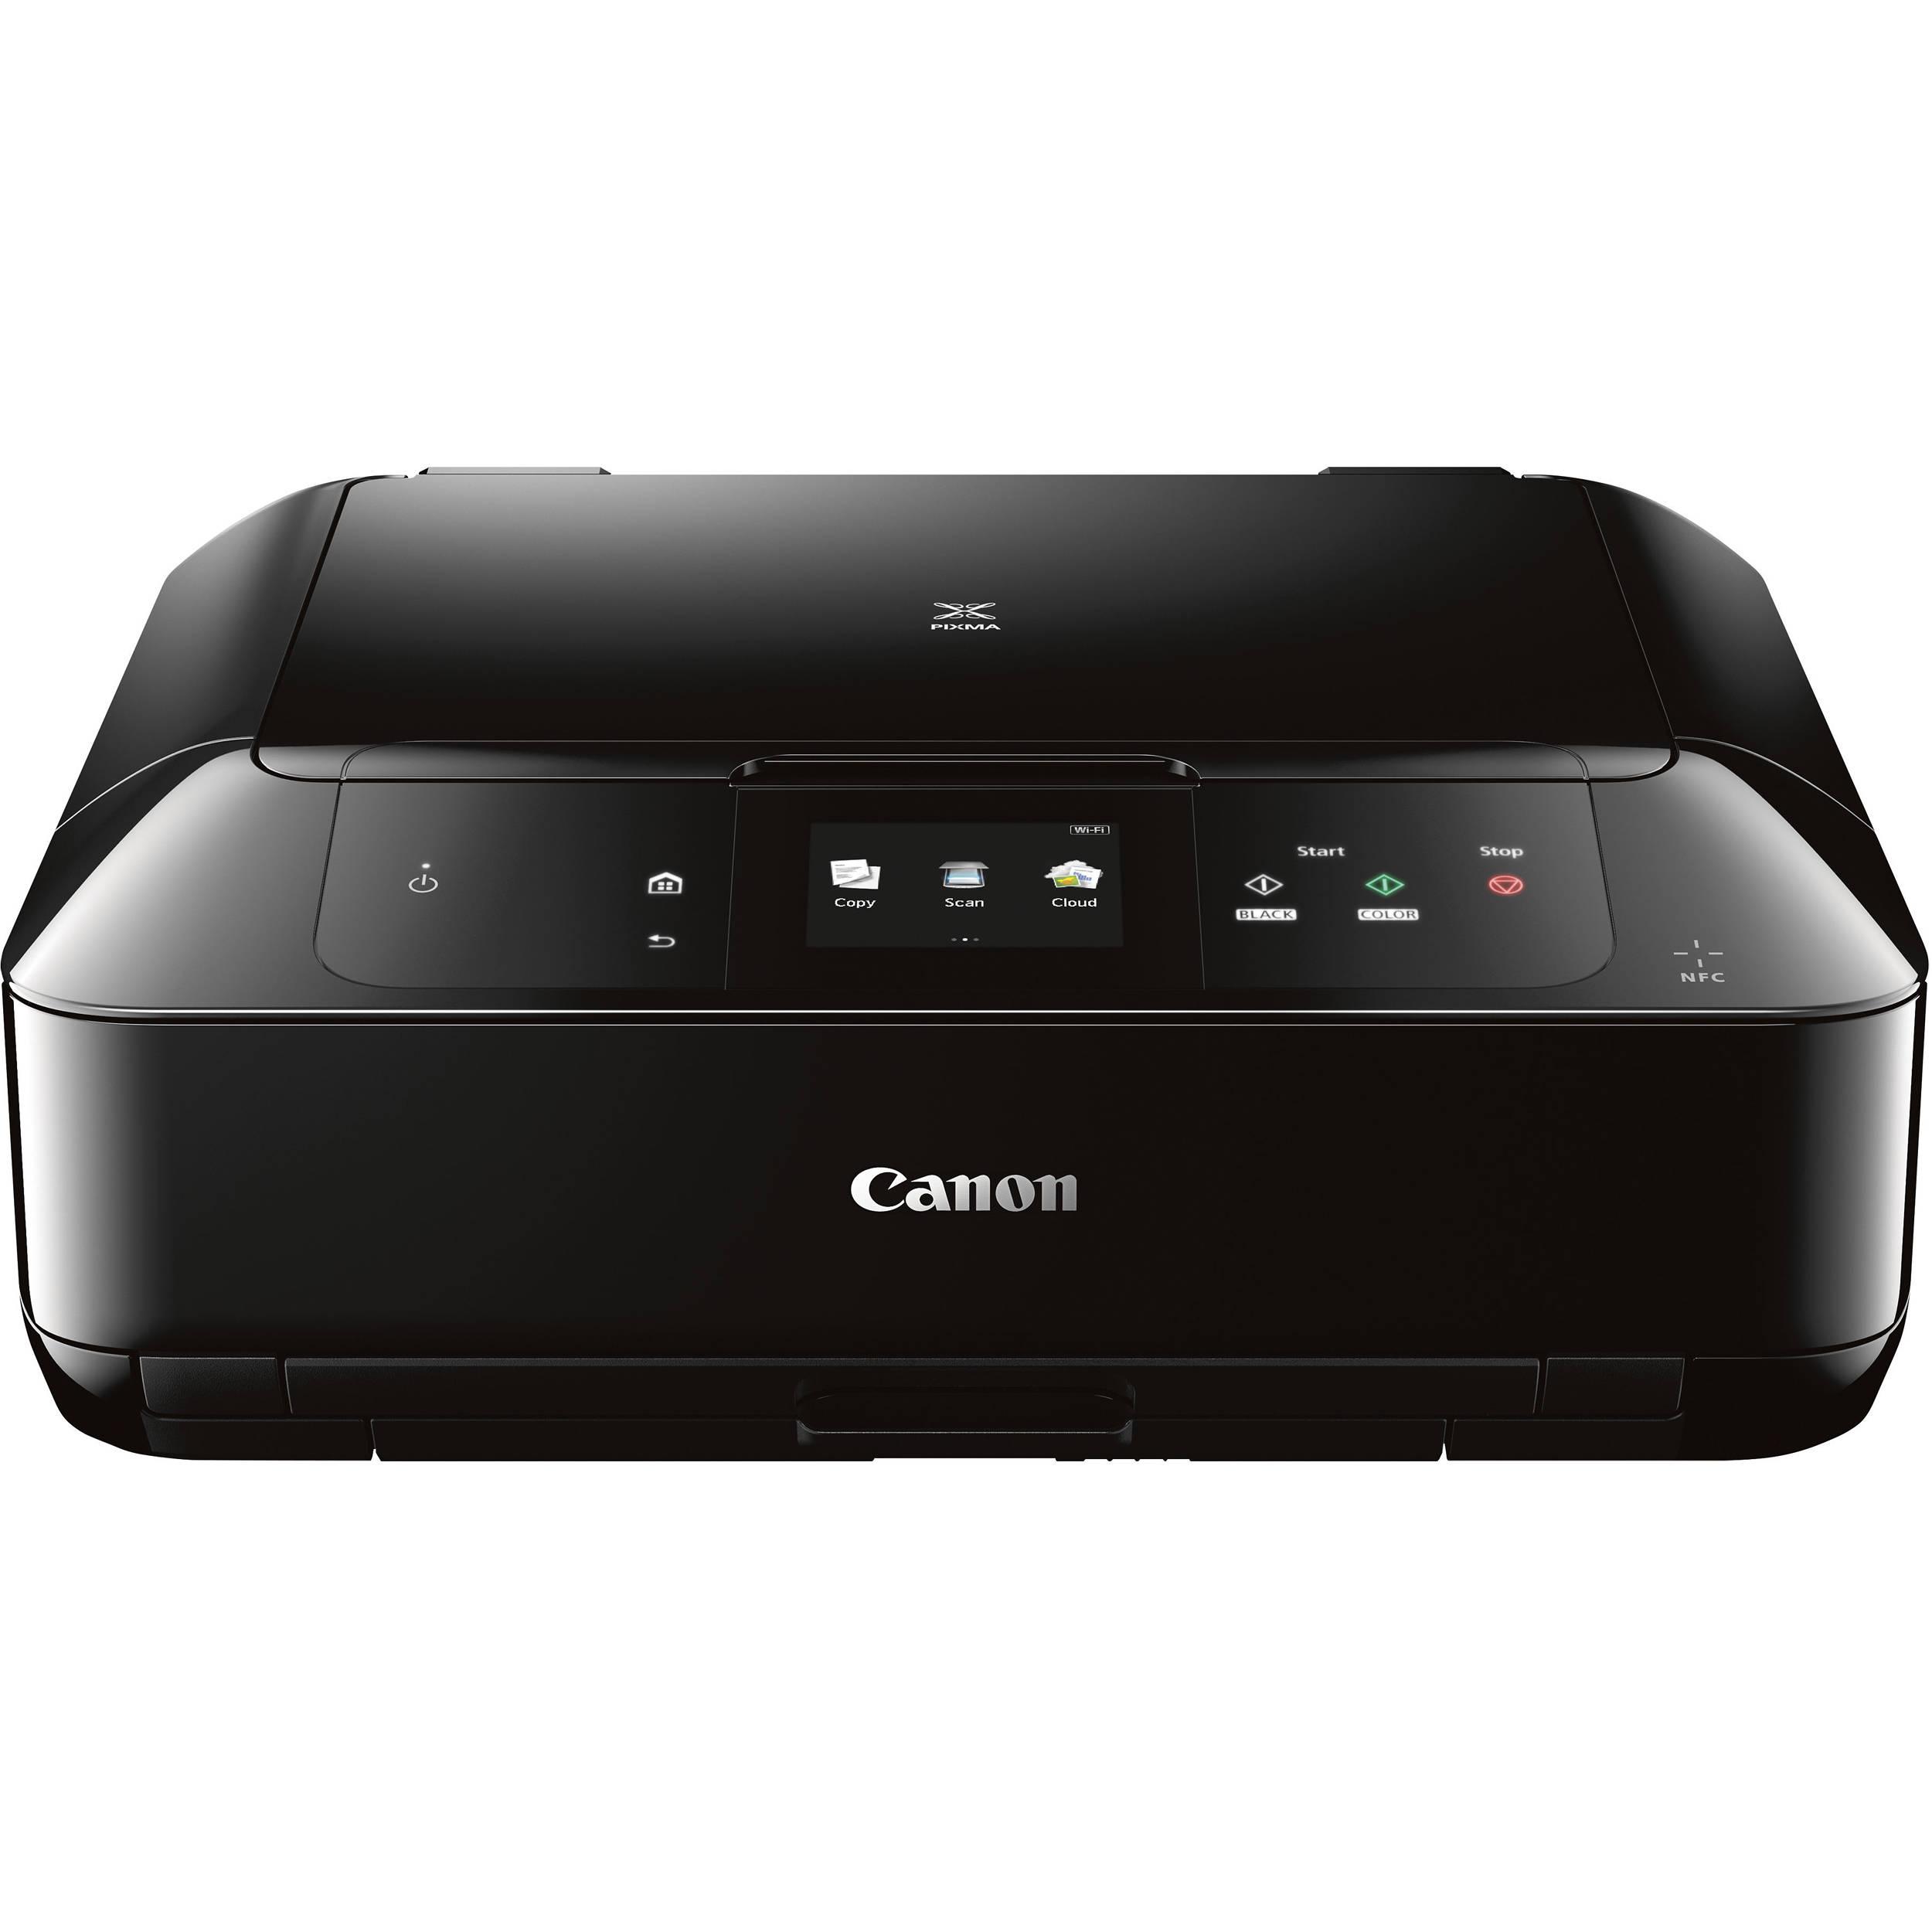 Canon PIXMA MG7720 Wireless All In One Inkjet Printer Black